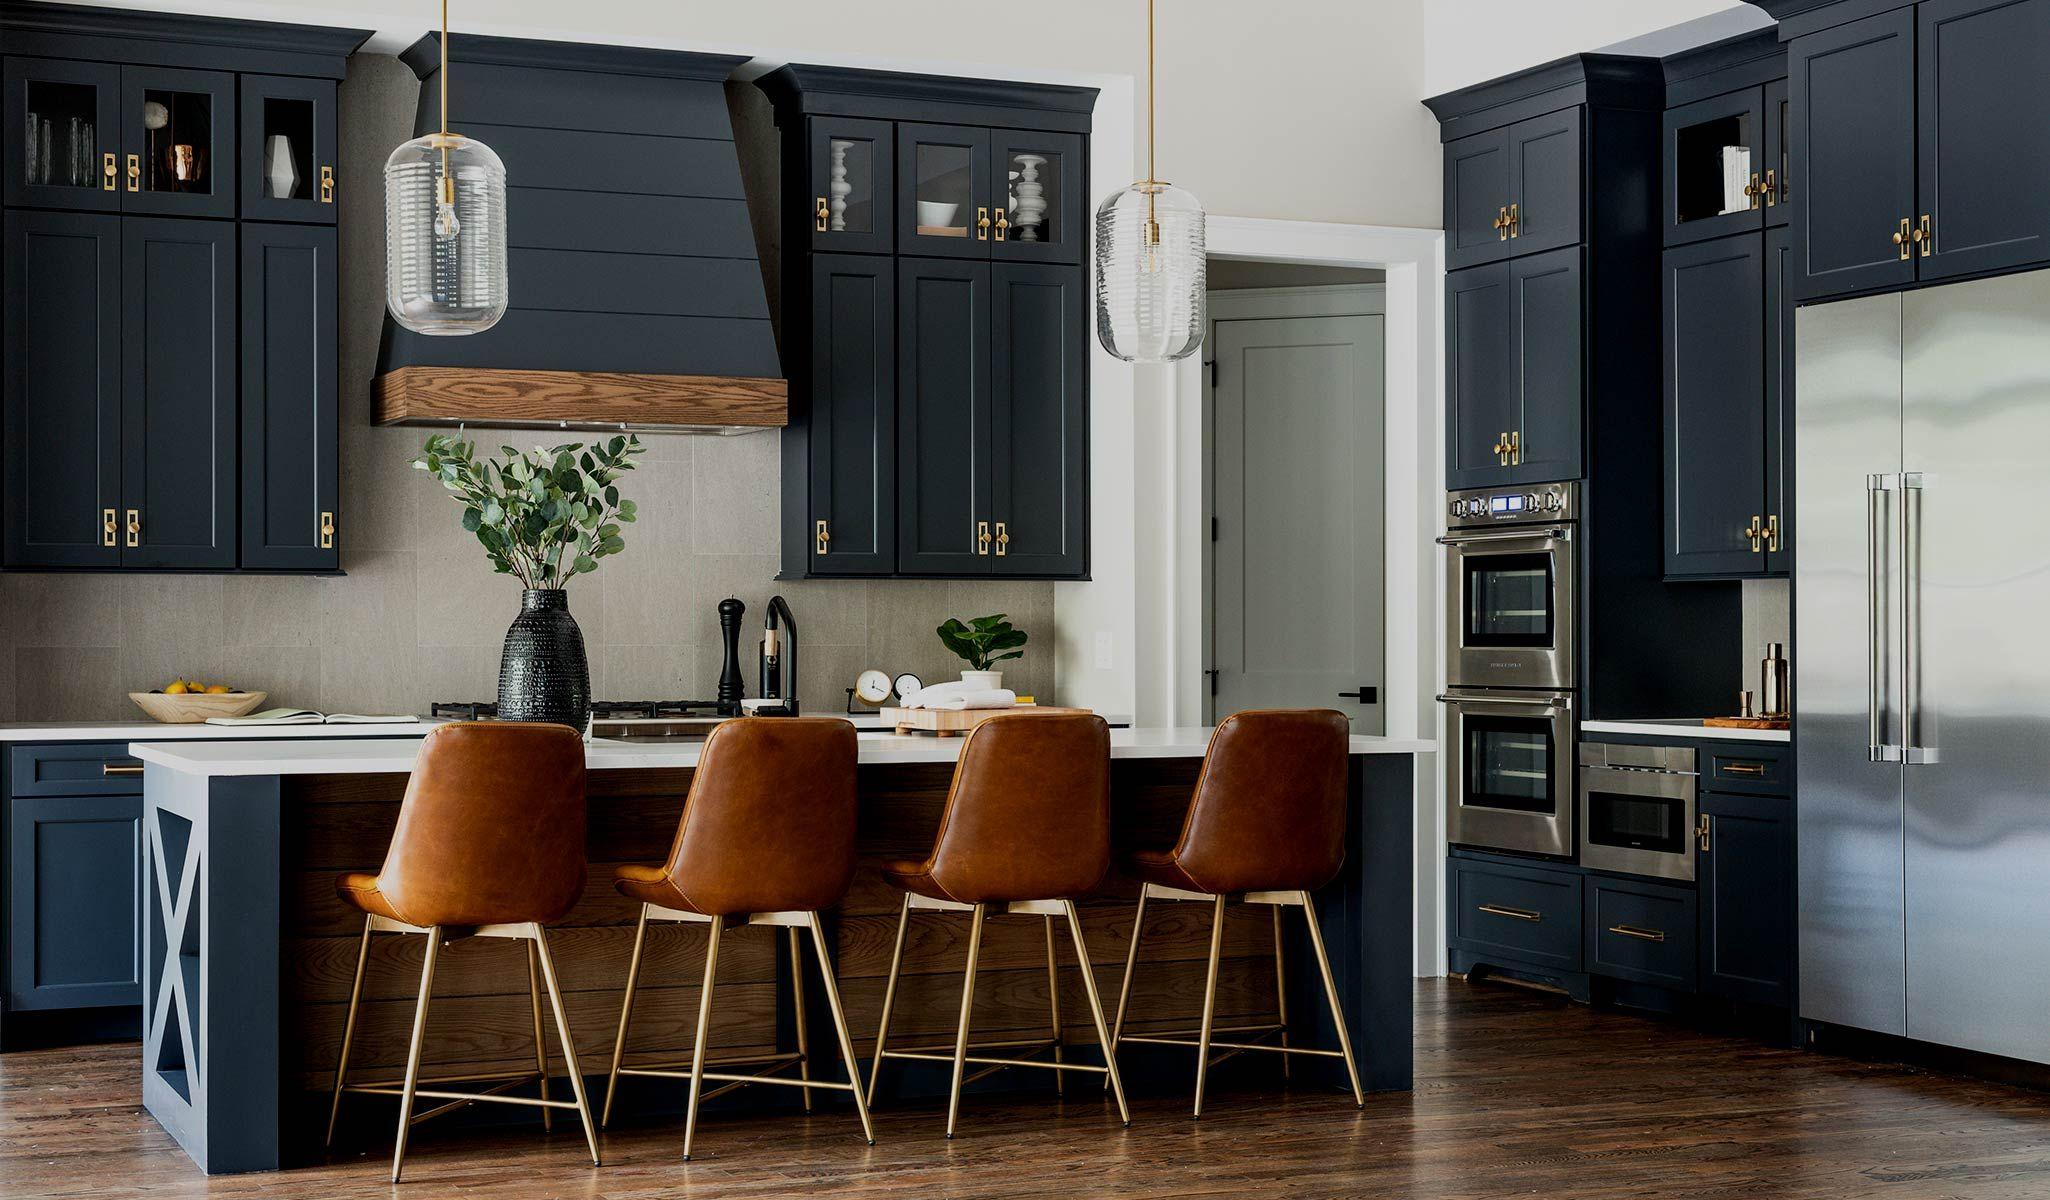 K Series White Kitchen Cabinets Stockcabinetexpress In 2020 White Kitchen Cabinets Used Kitchen Cabinets Kitchen Cabinets